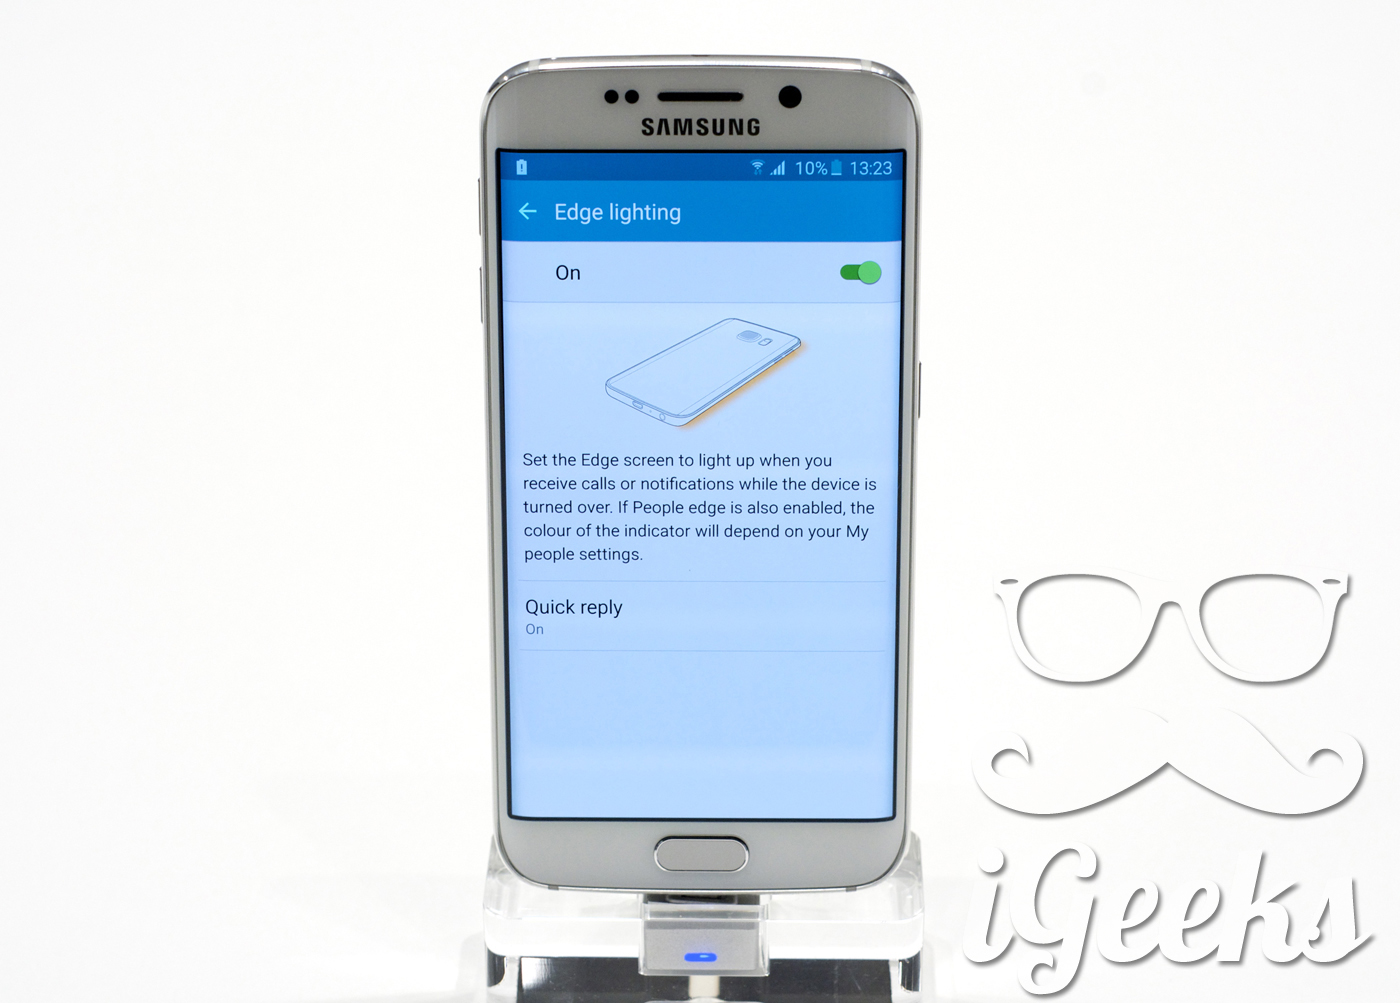 iGeeks-Samsung-S6-MWC2015-17